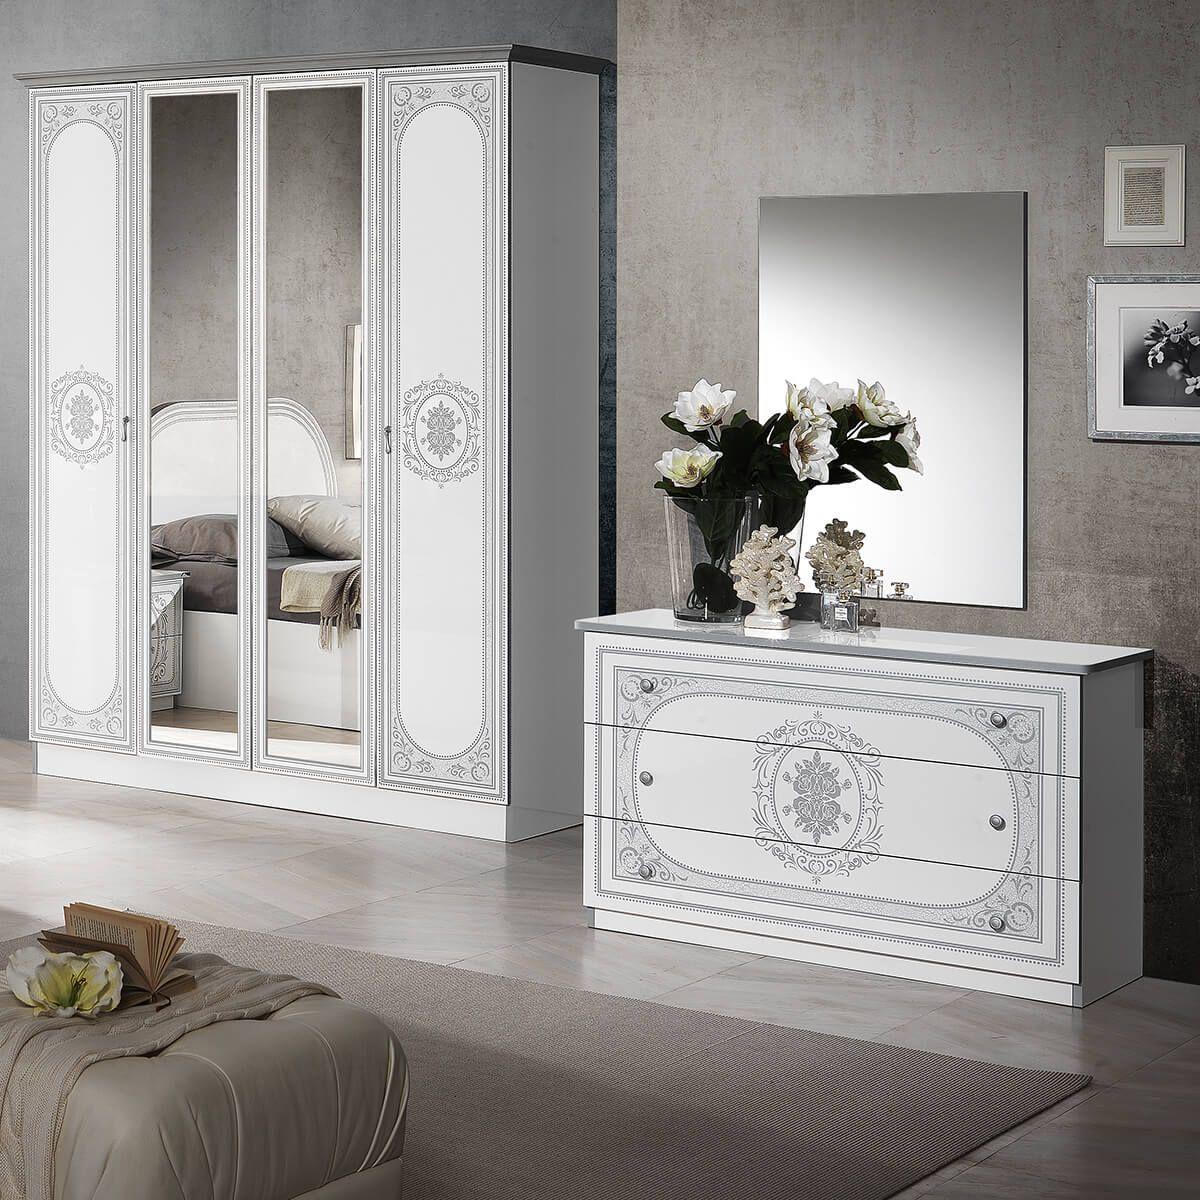 Altobuy-Solaya-Chambre-Complete-avec-Lit-160x200cm-Neuf miniature 3